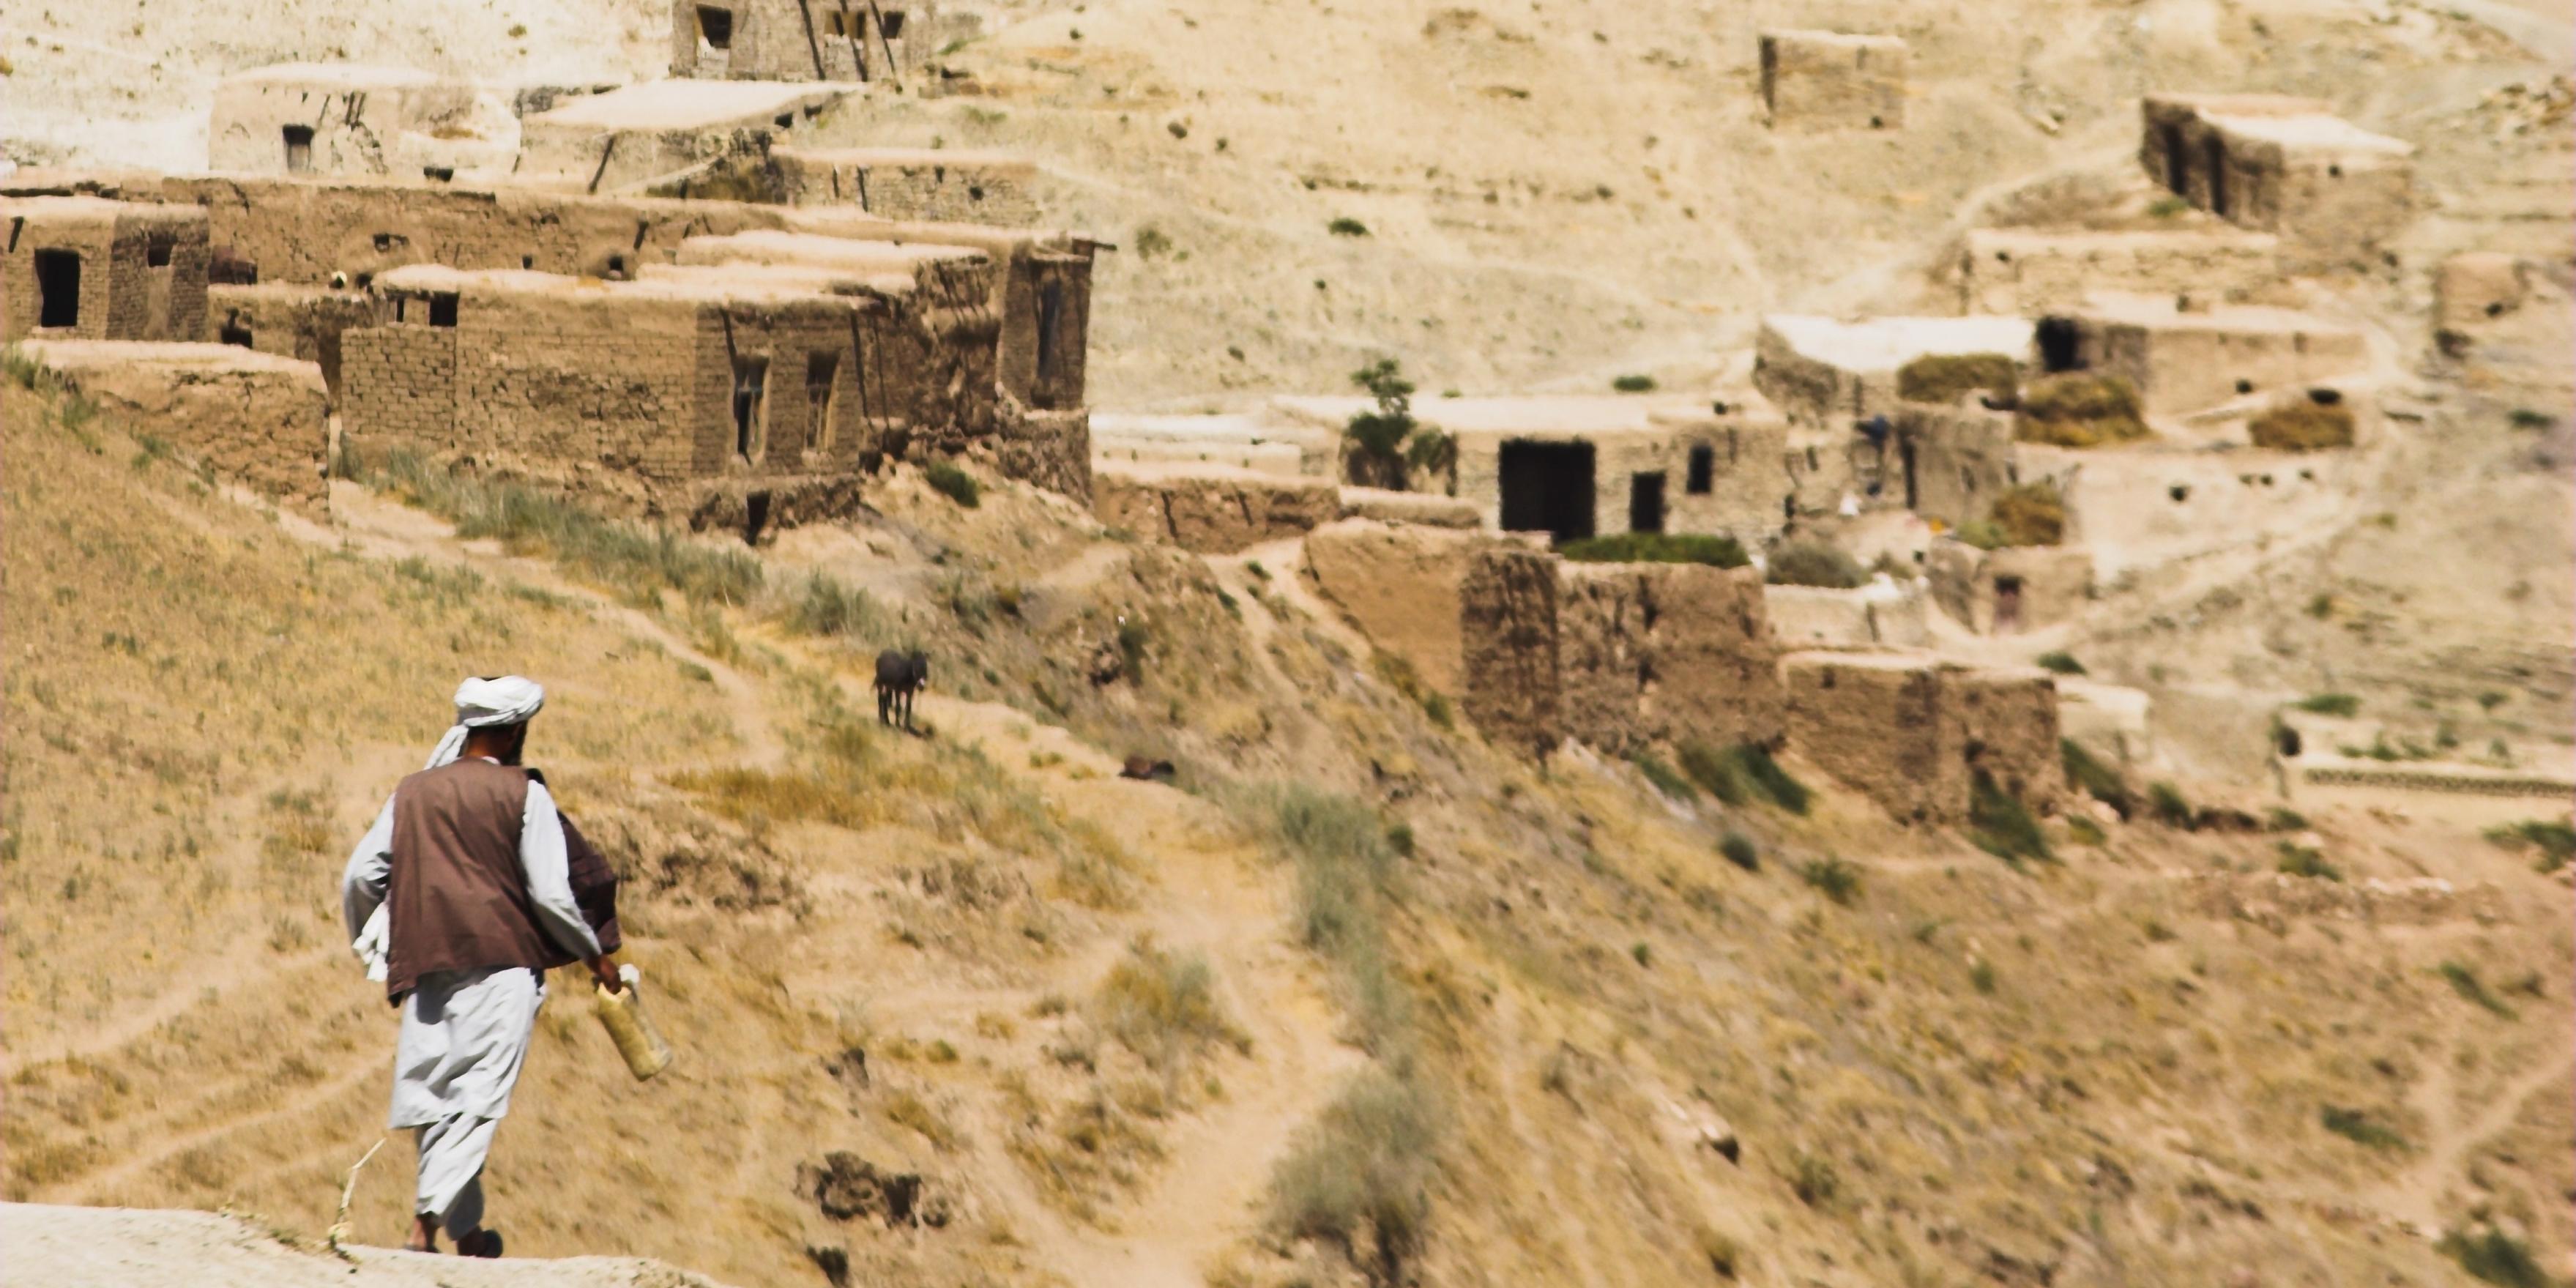 VILLAGE AFGHANISTAN